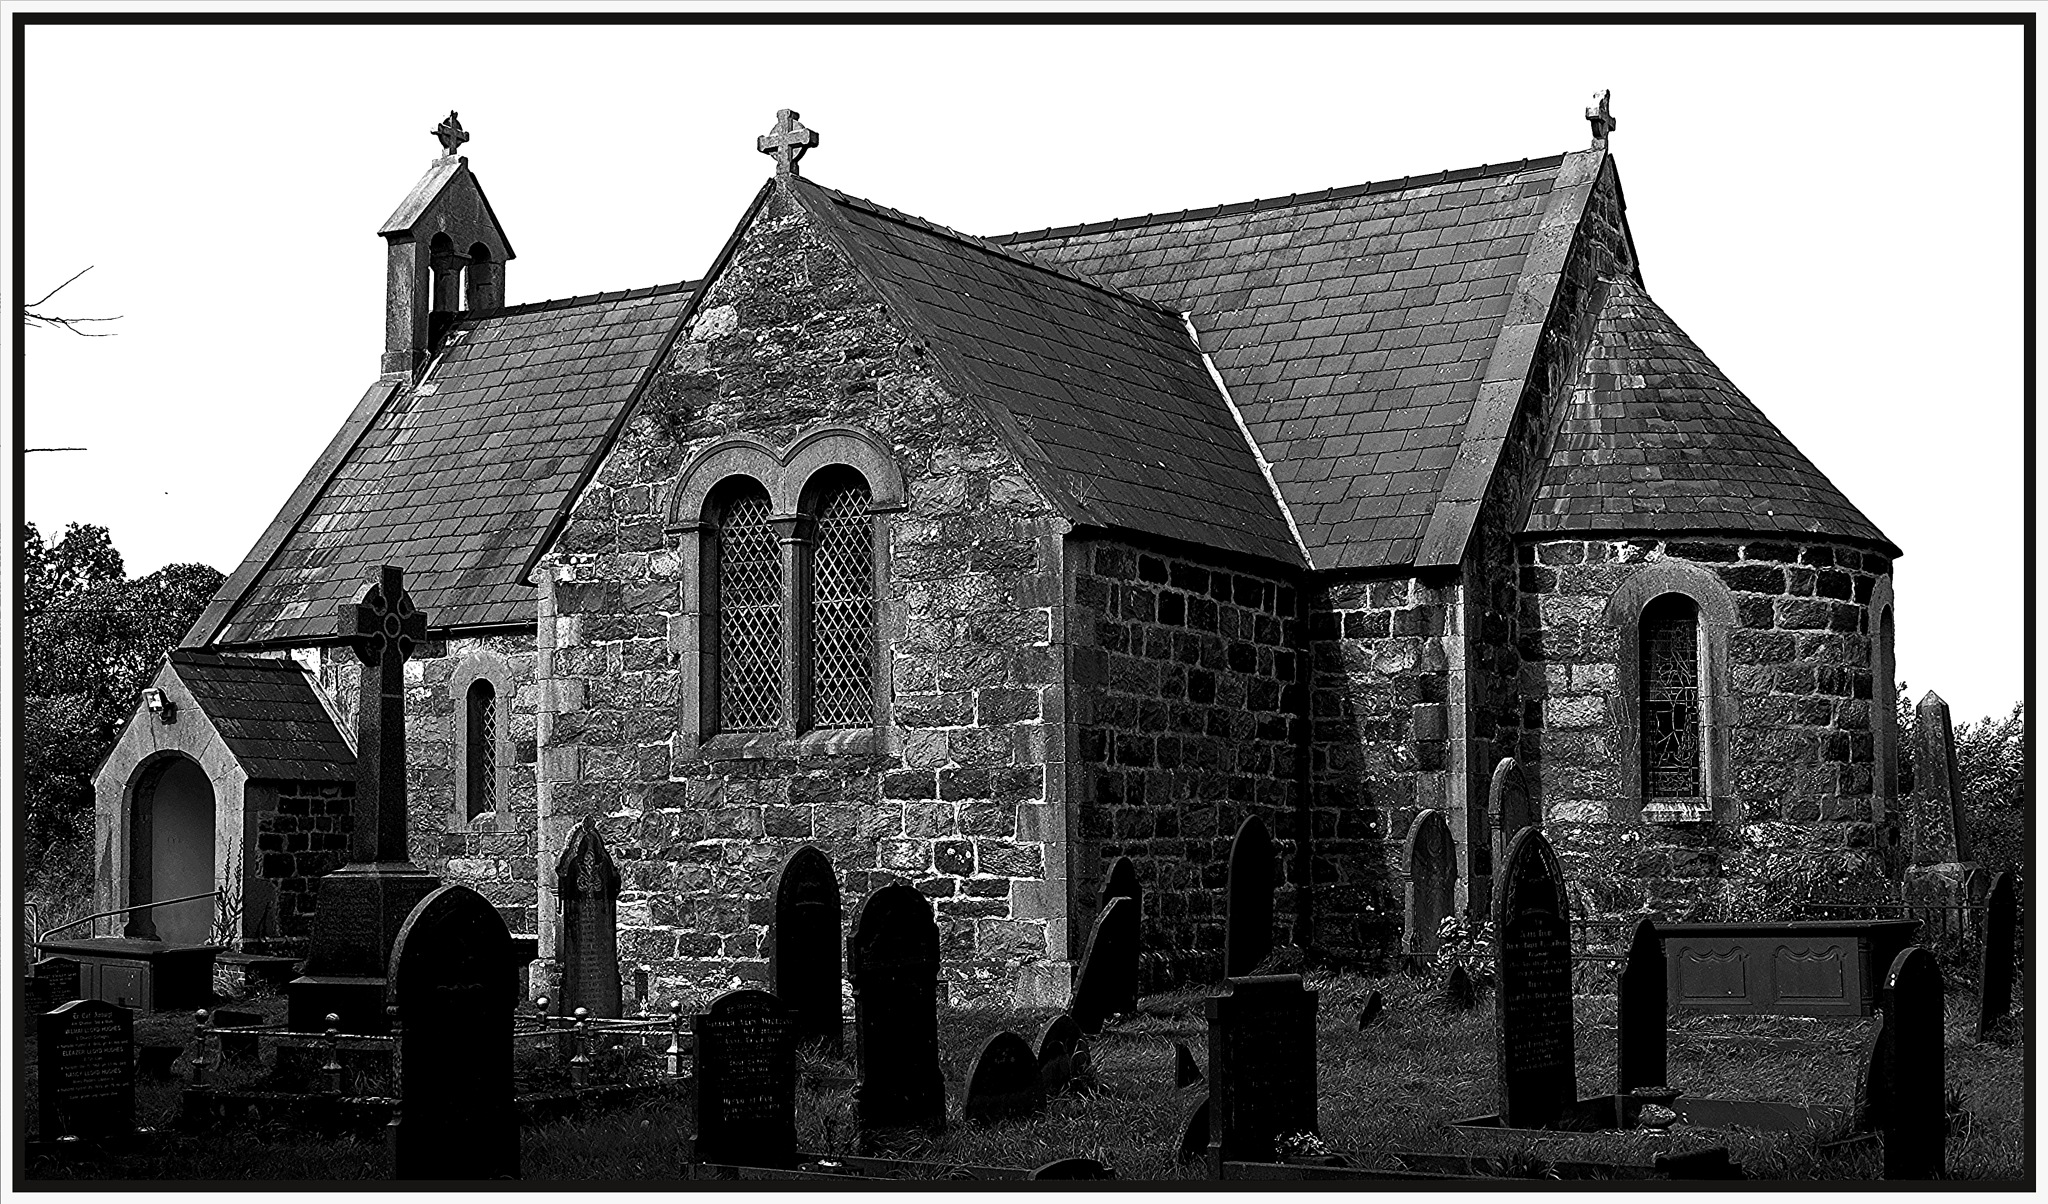 LLanwnda  N,Wales. by rupertstanley